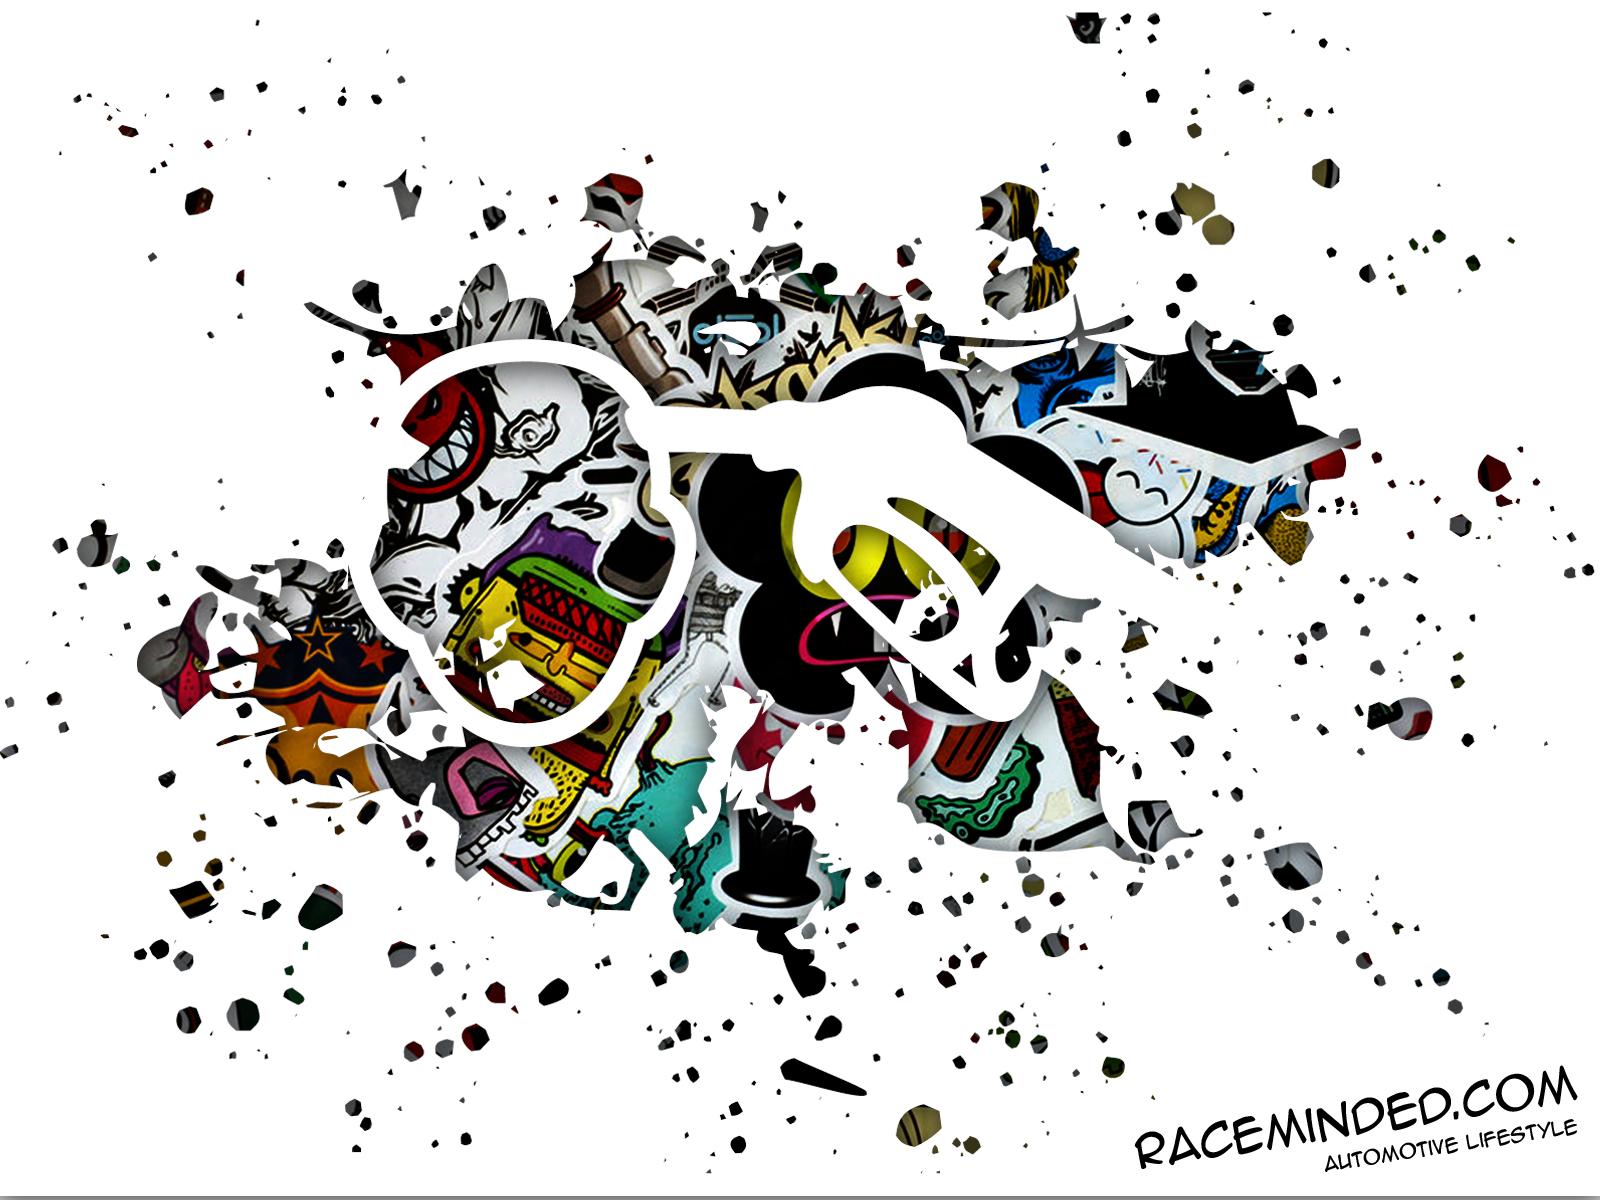 Logo wallpaper 6545 hd jdm logo wallpaper 6545 hd wallpapers 1600x1200